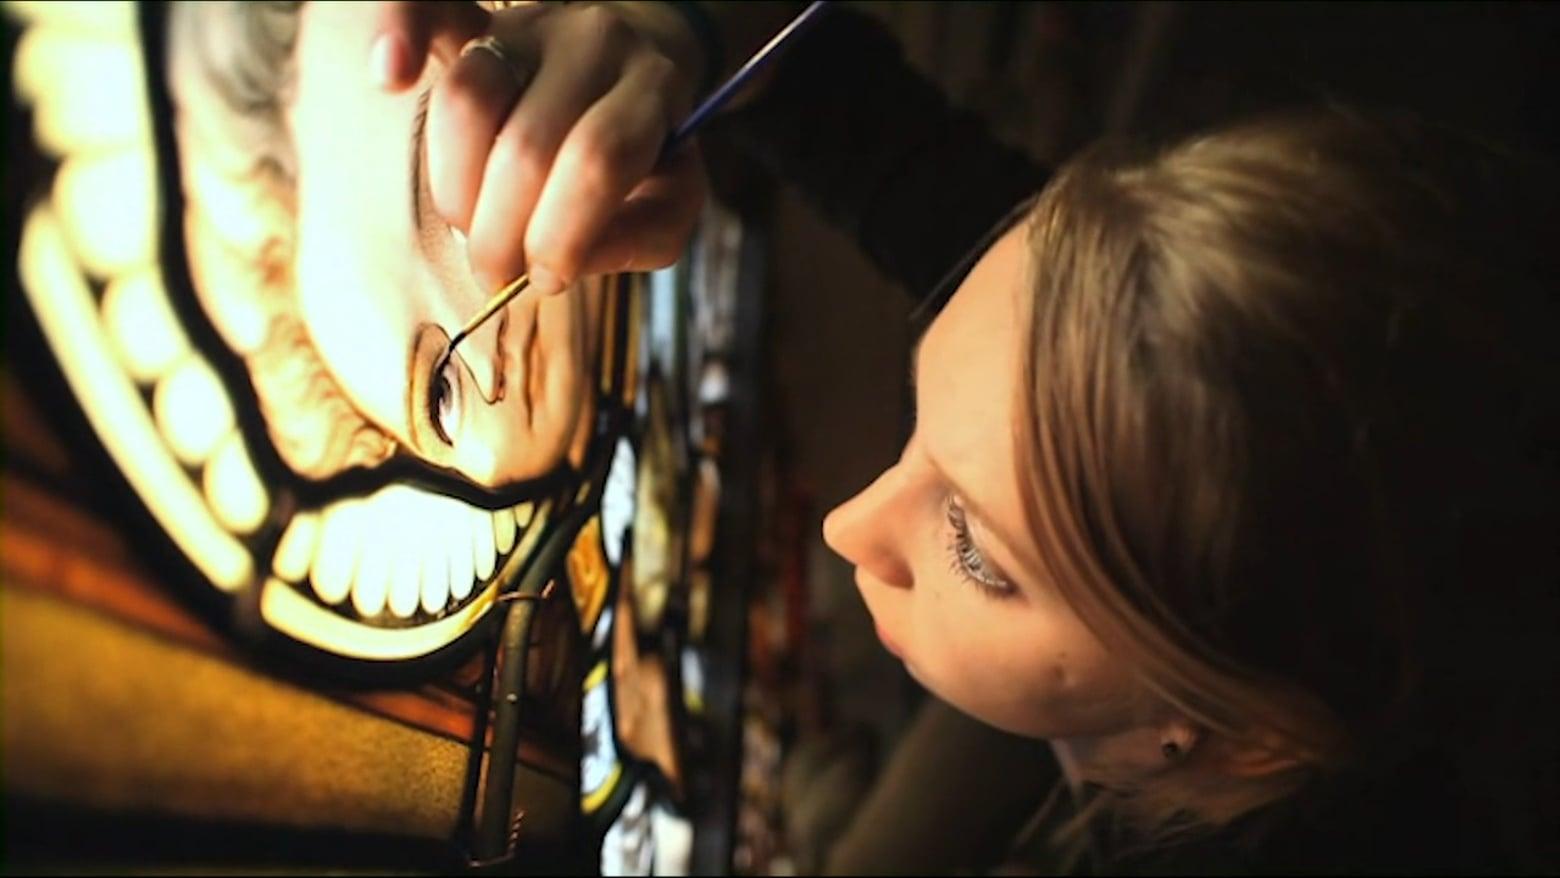 LIFE IS BEAUTIFUL 10 - Rob Hodselmans Cinematographer